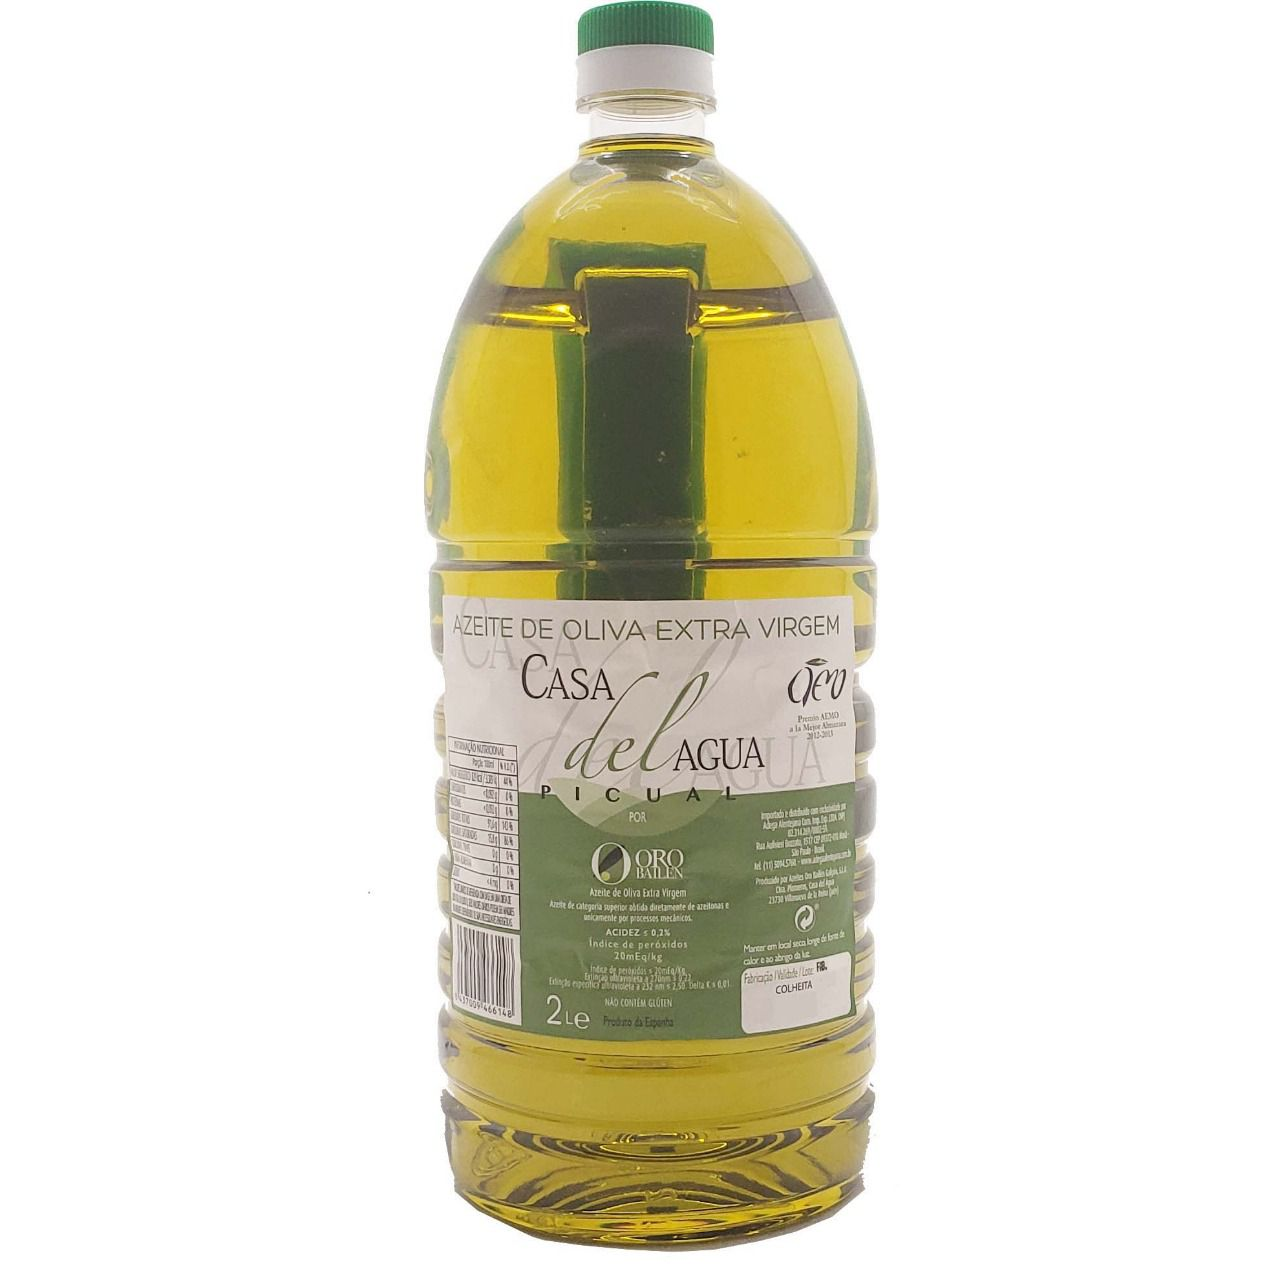 Azeite de Oliva Extra Virgem Casa Del Agua - 2L -